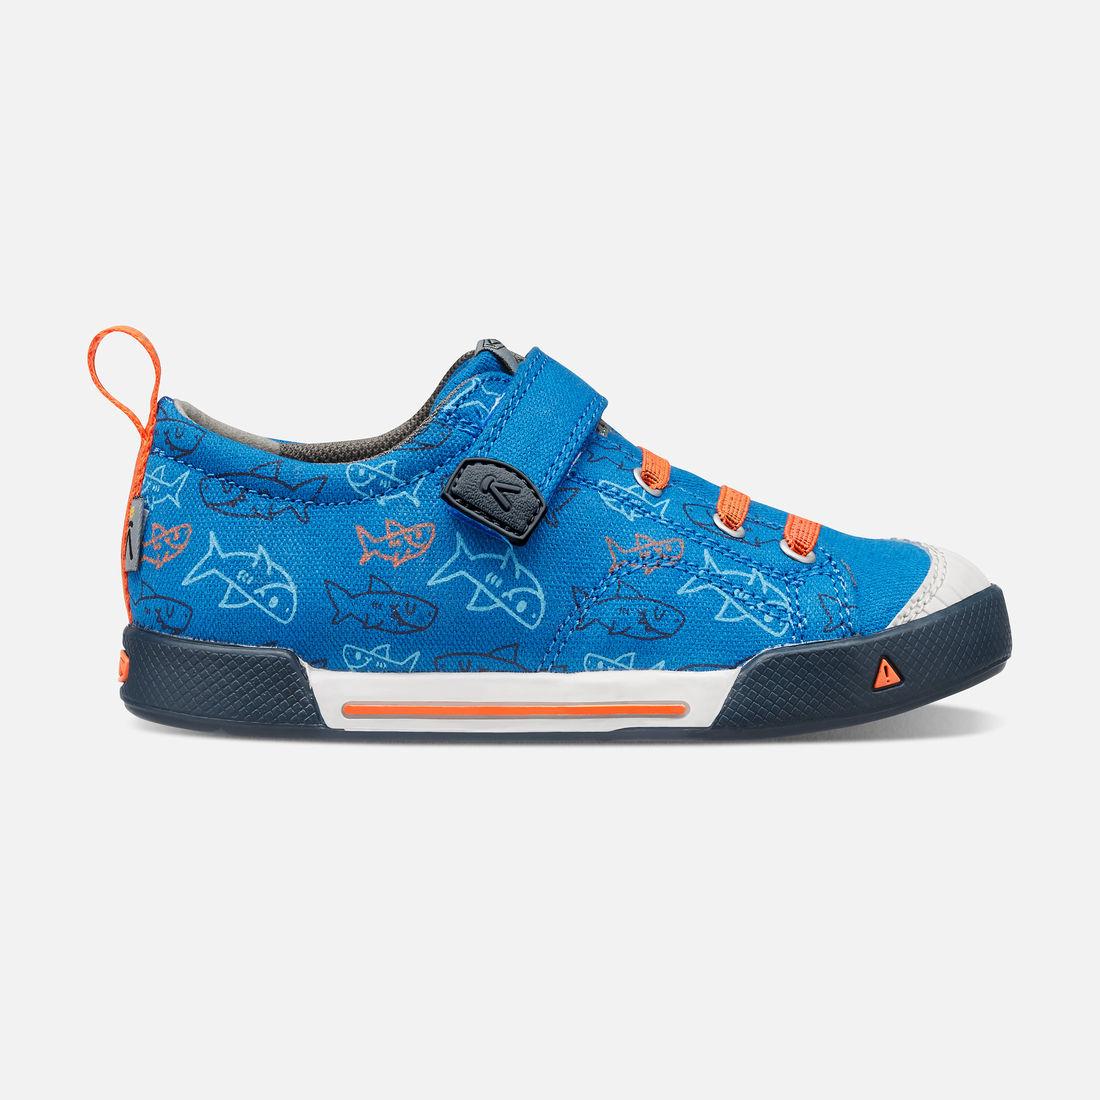 Kids' shark shoes: Keens Encanto Finley | Keens